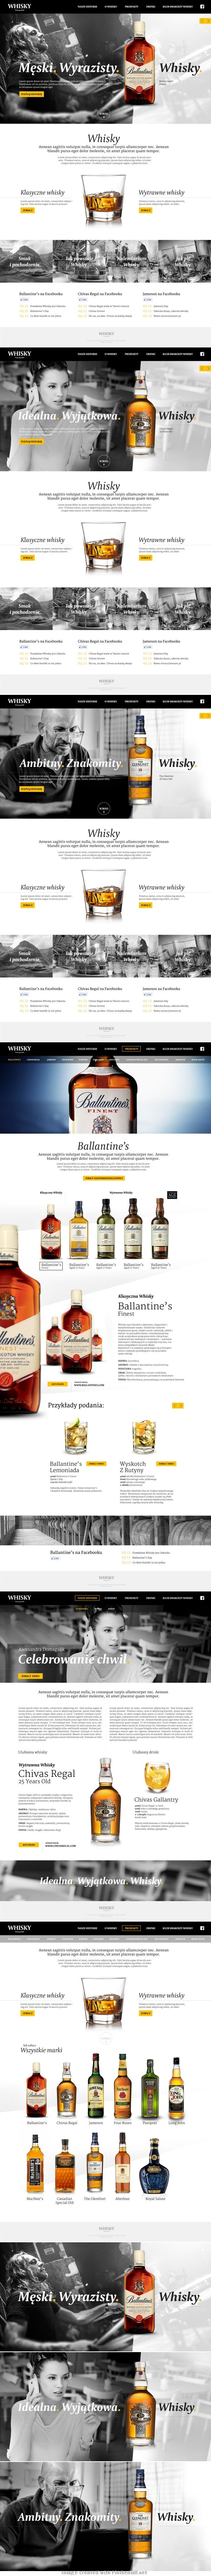 Ballantine's whisky  #ProntoDigital #WebDesign